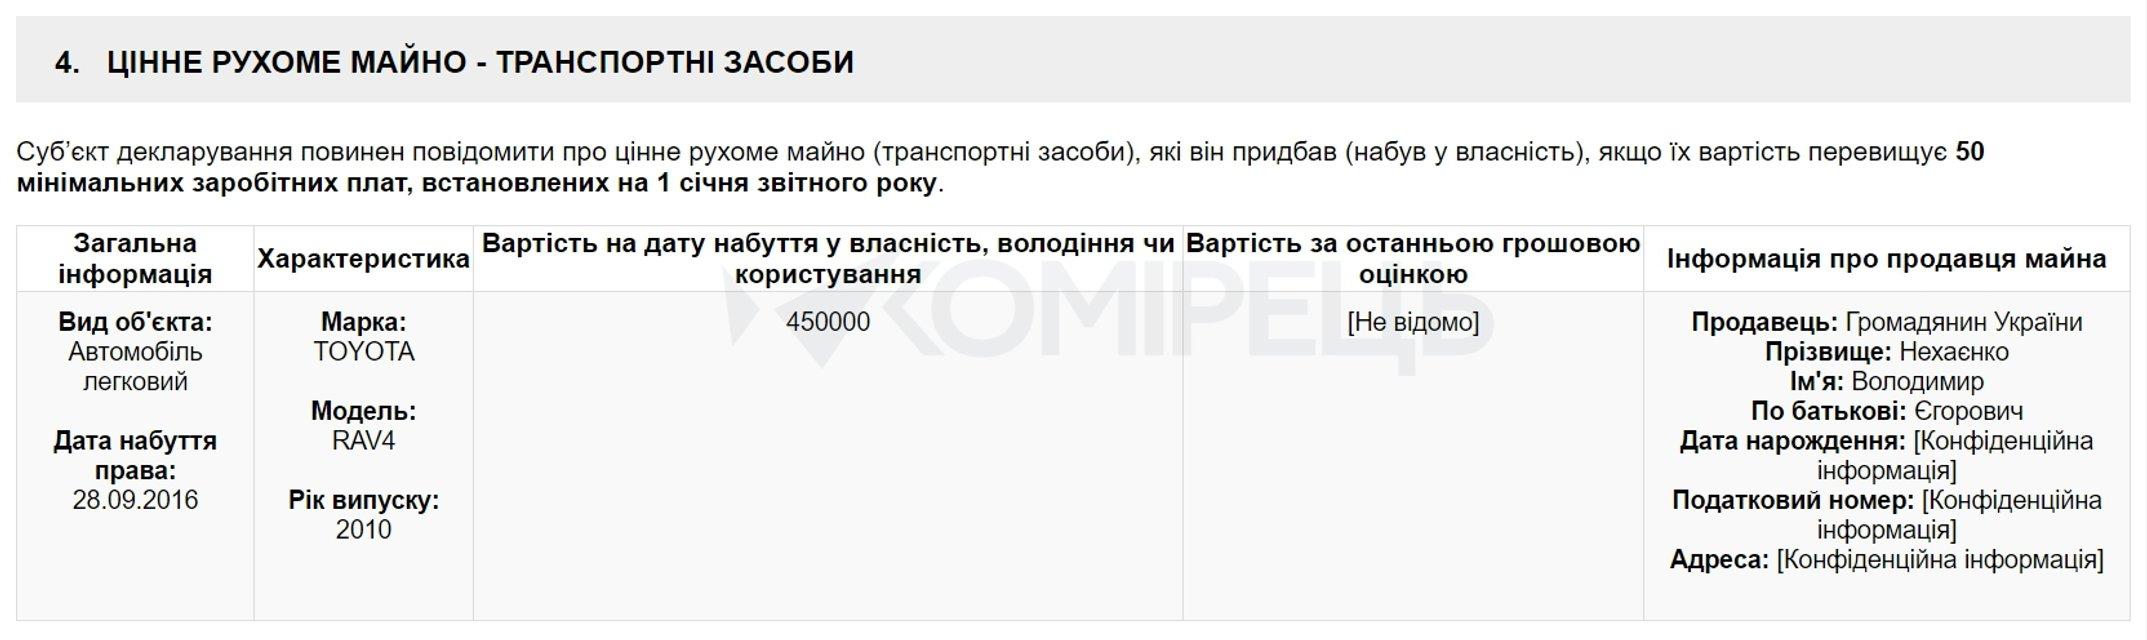 Прокурор из Харькова получила в подарок Toyota Rav4 за полмиллиона гривен - фото 22737